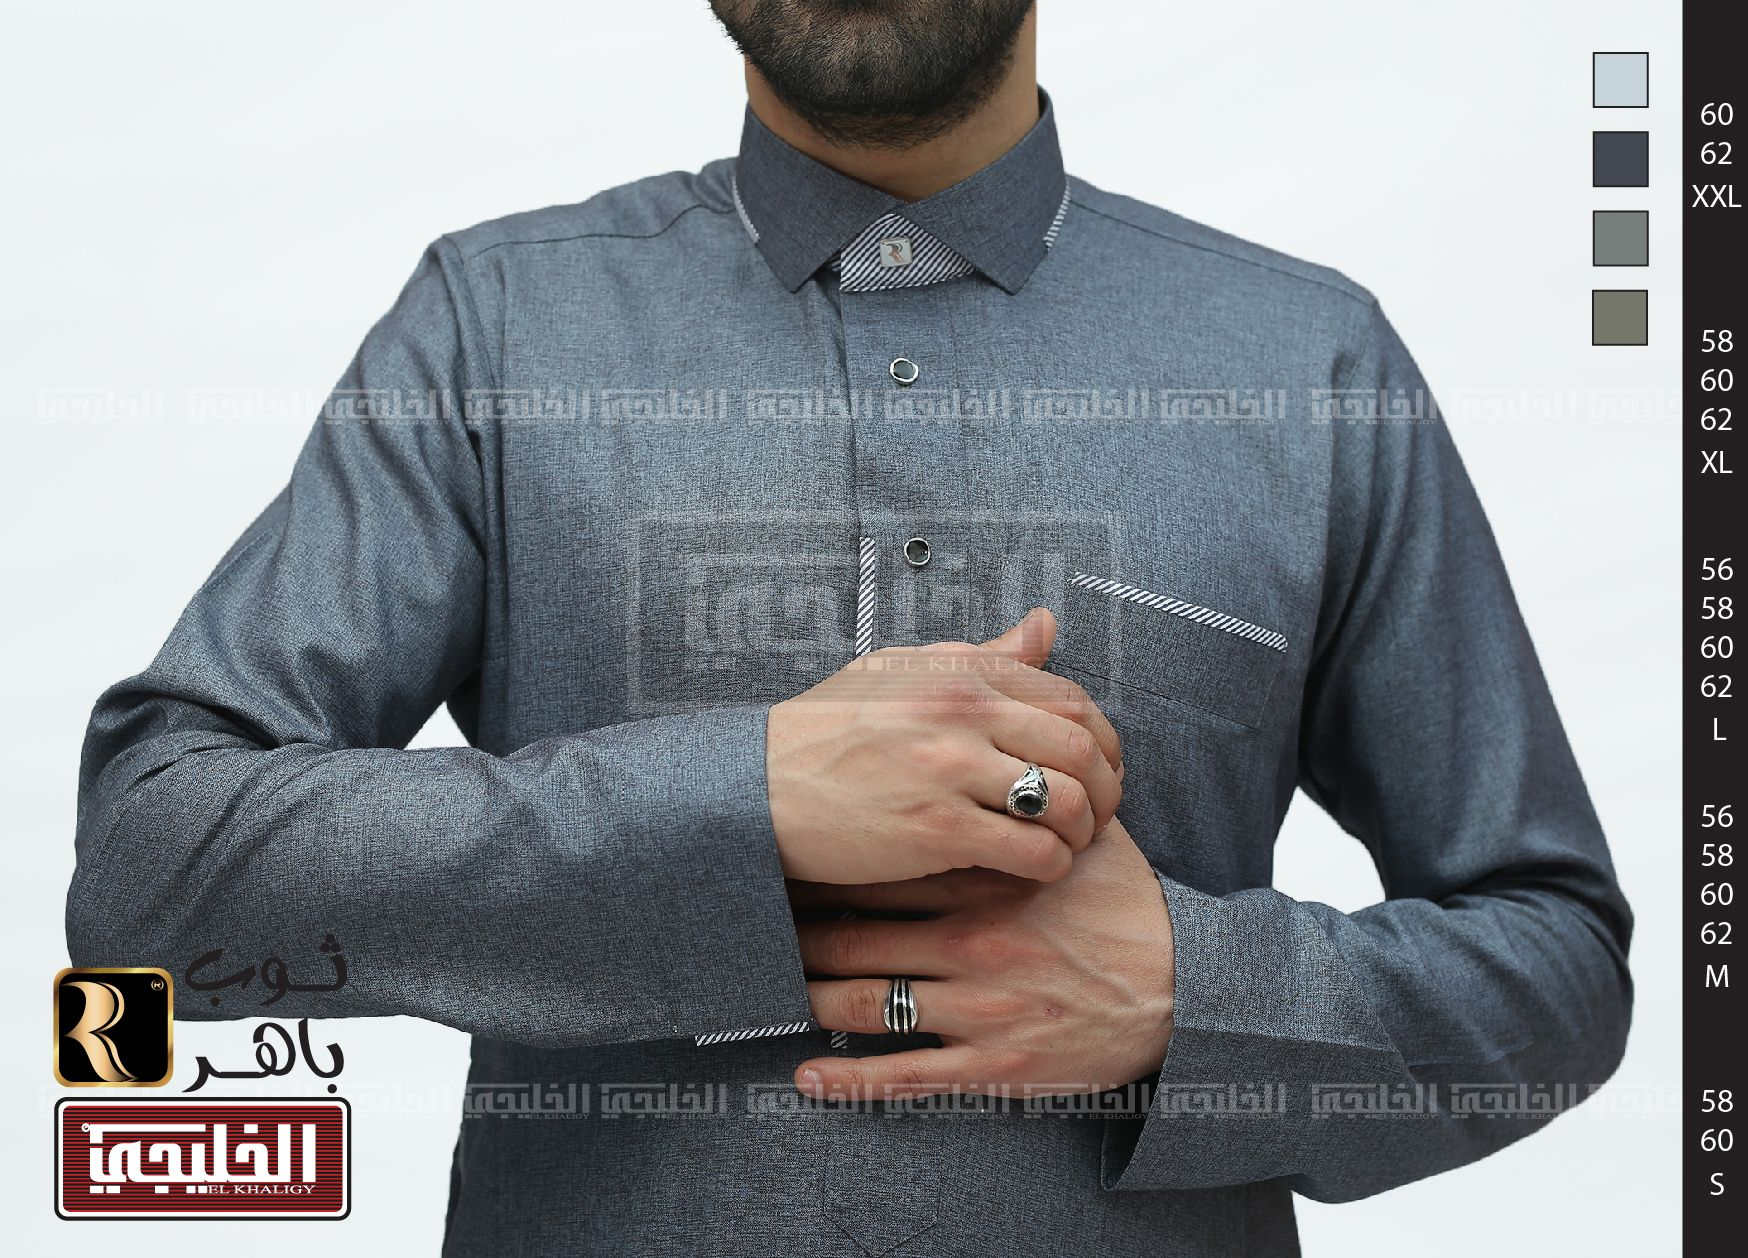 ثوب باهر Mens Tops Shirts Button Up Shirts